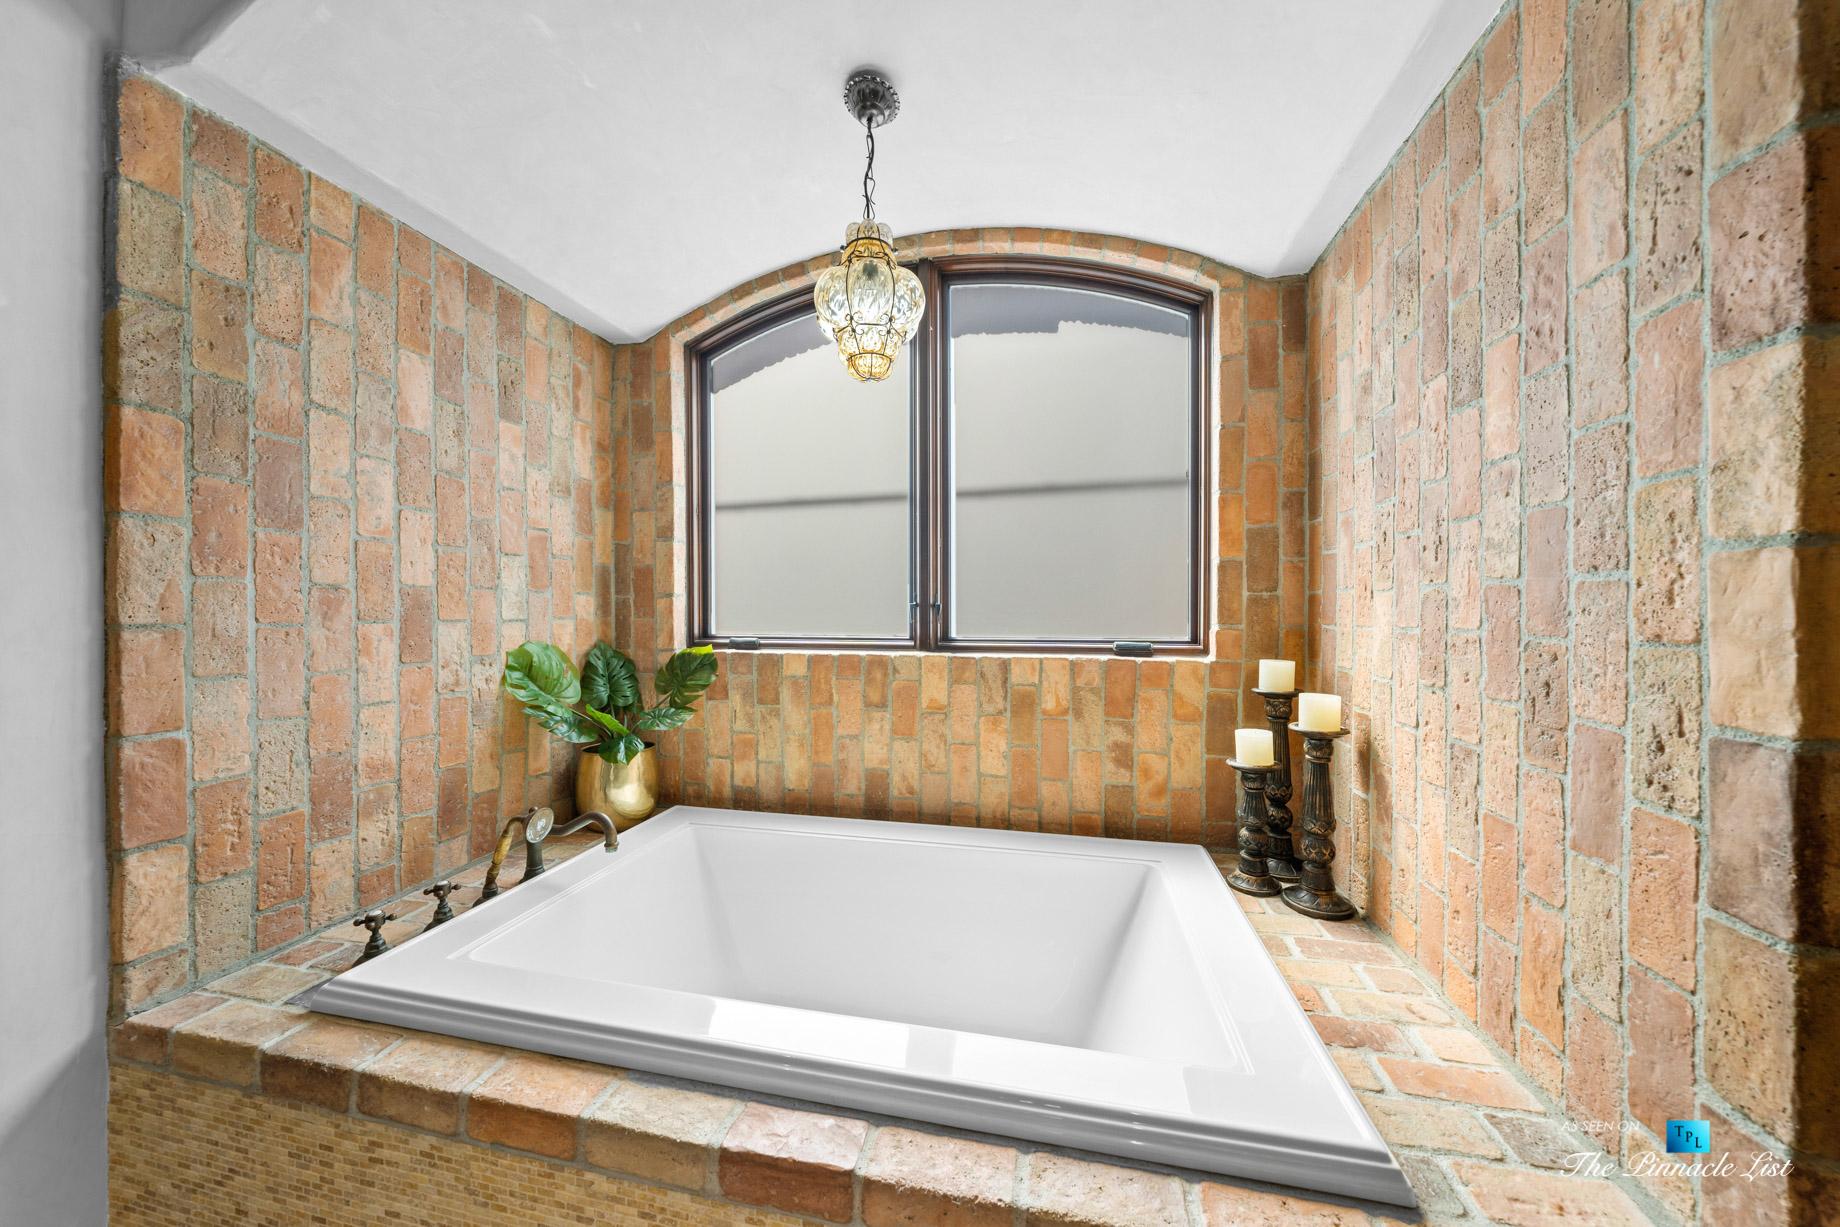 216 7th St, Manhattan Beach, CA, USA – Luxury Real Estate – Coastal Villa Home – Master Bathroom Tub